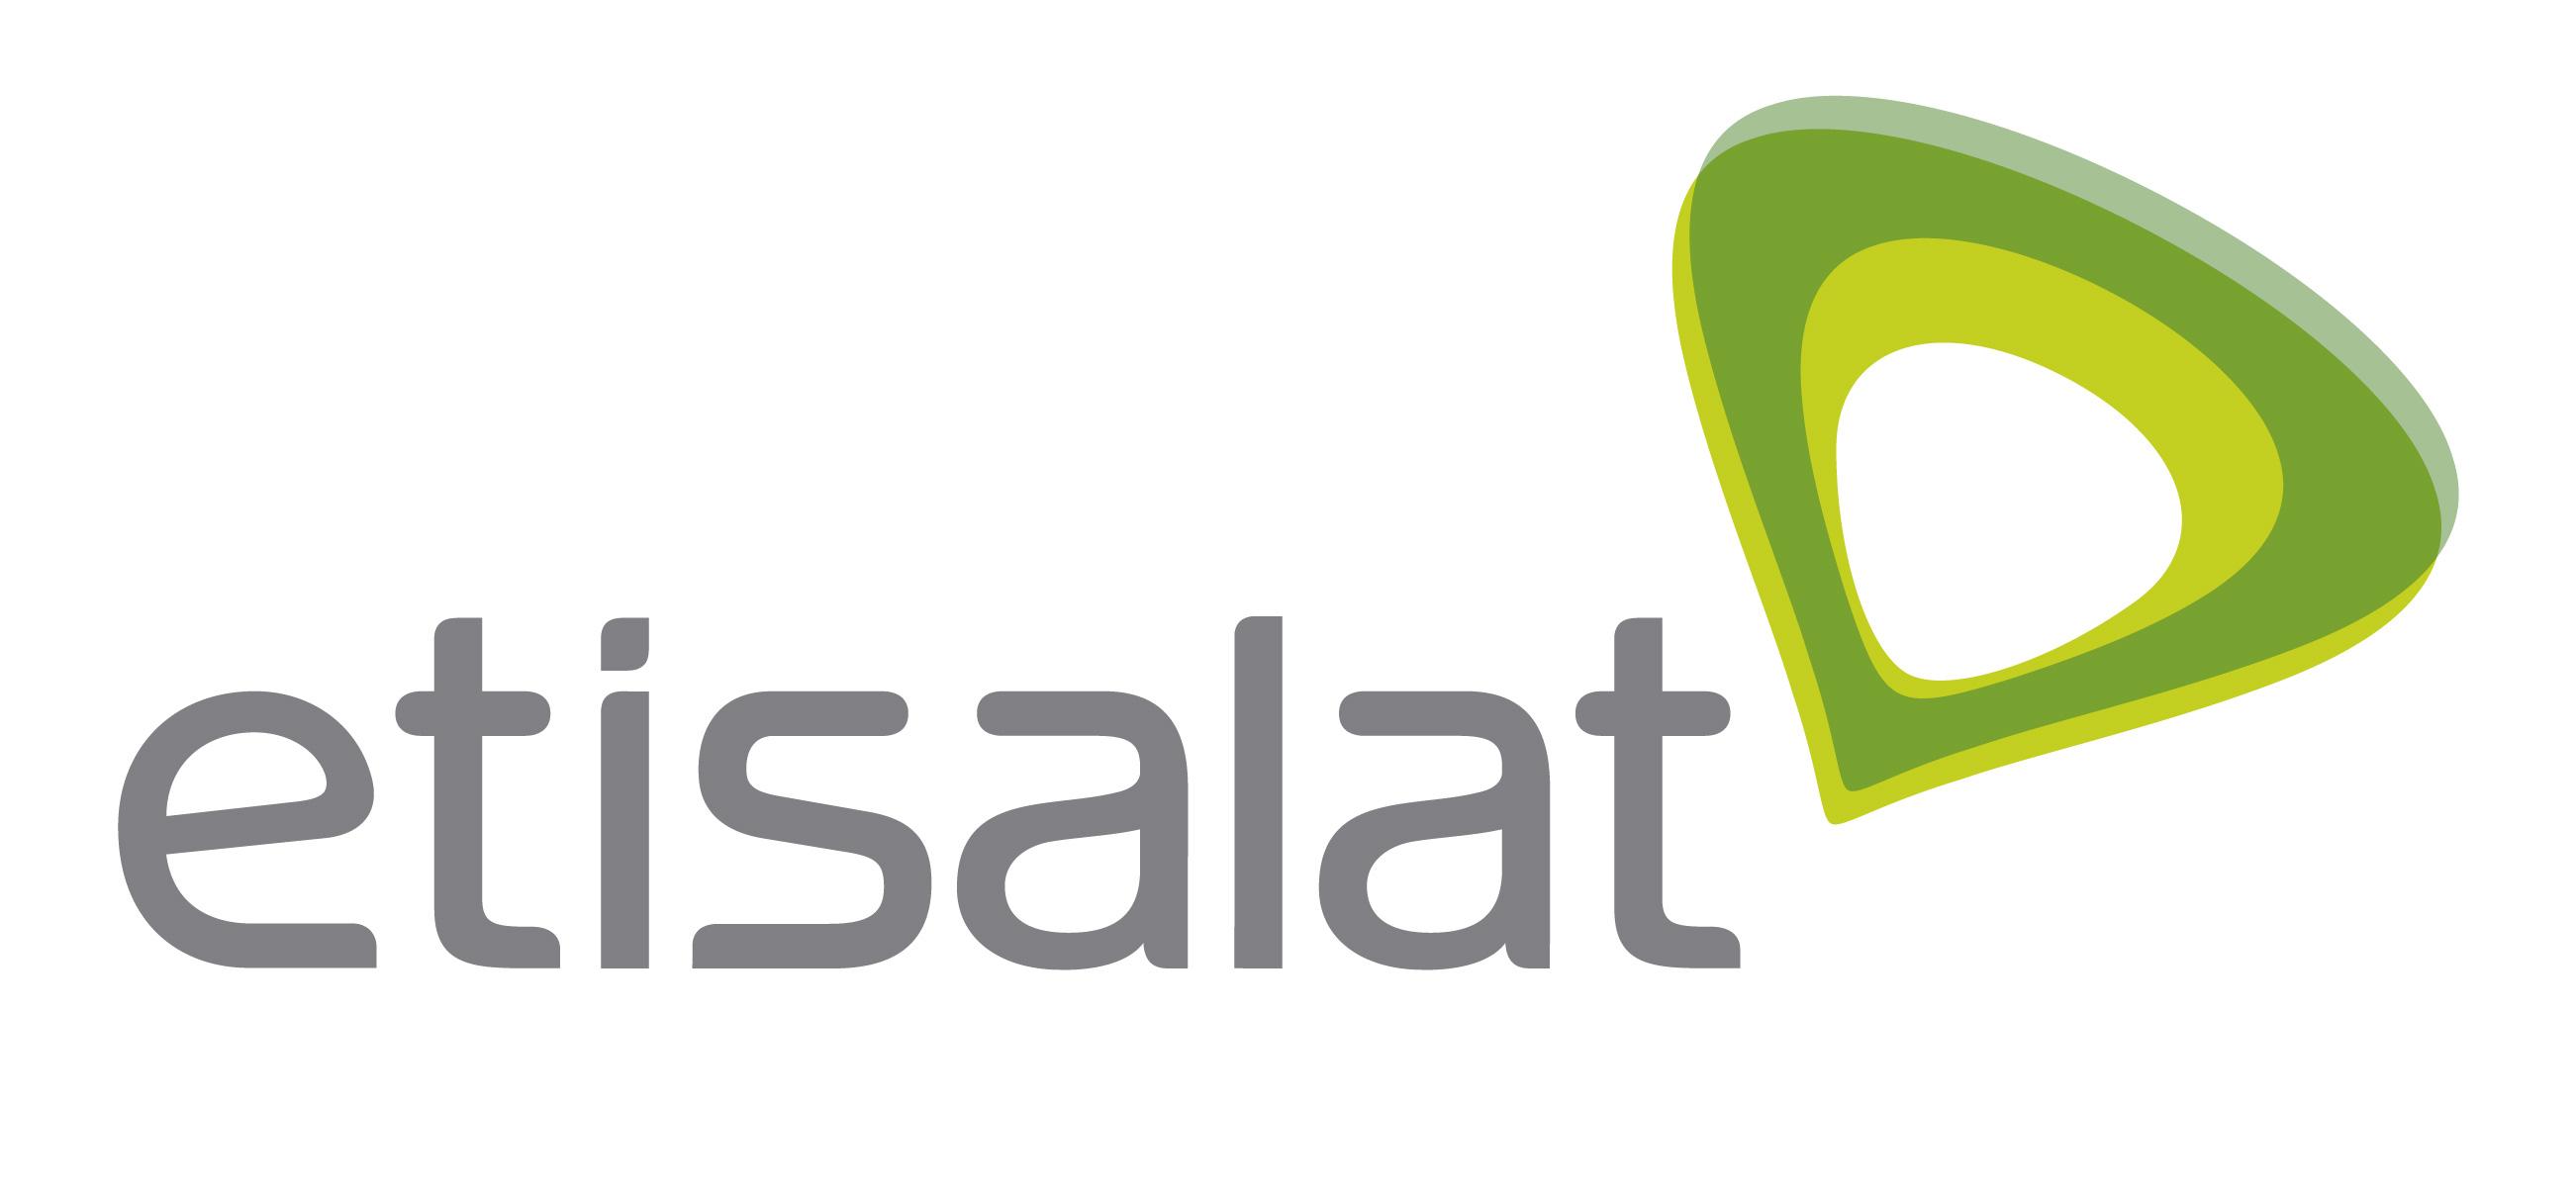 Shareholders Want Etisalat's Takeover, Banks Seek Mubadala's Prosecution